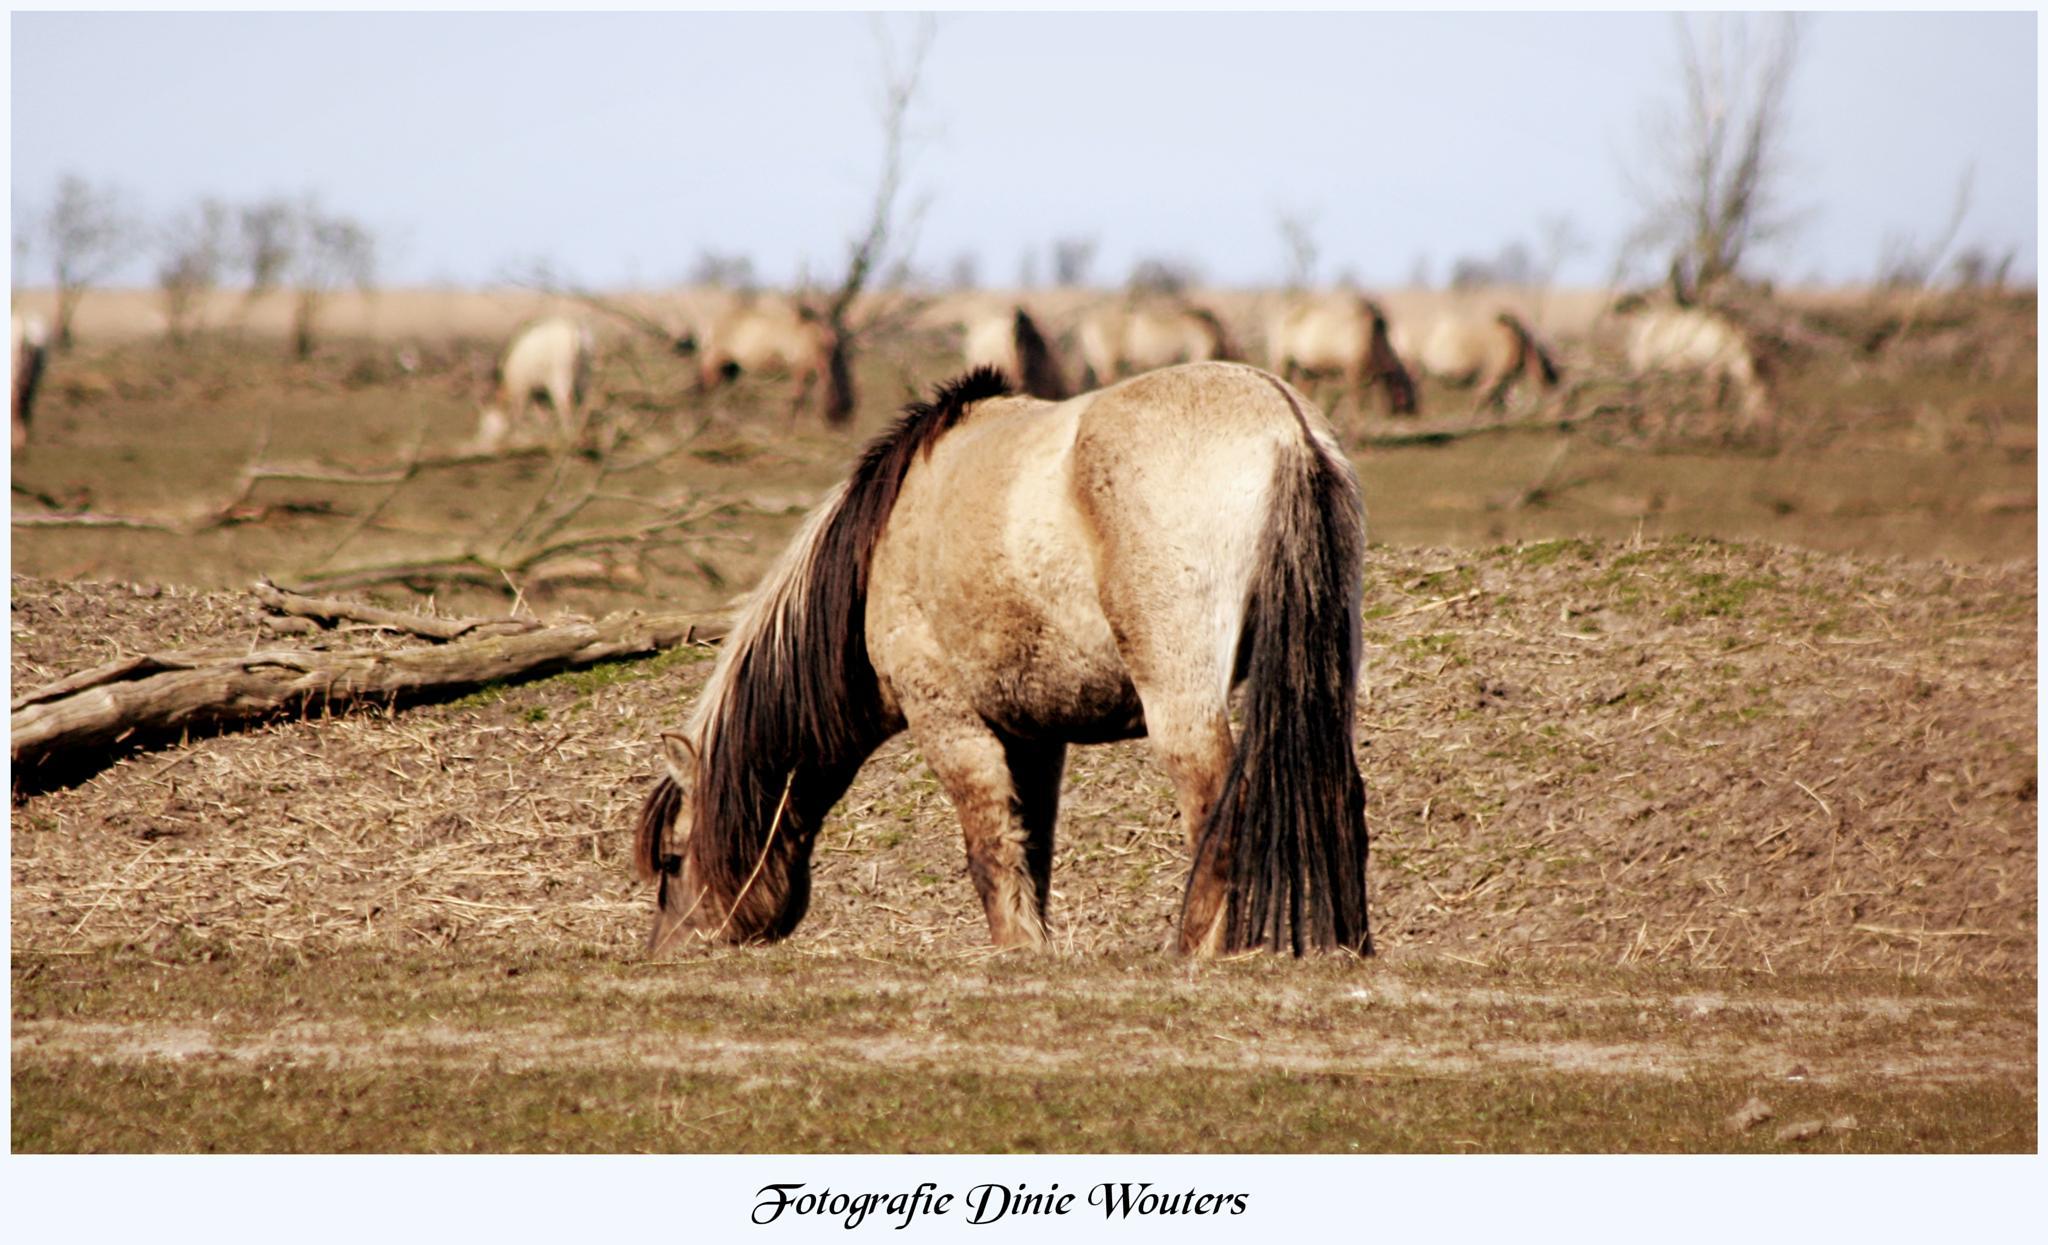 Ooievaars Plassen / Konik paarden by Dinie